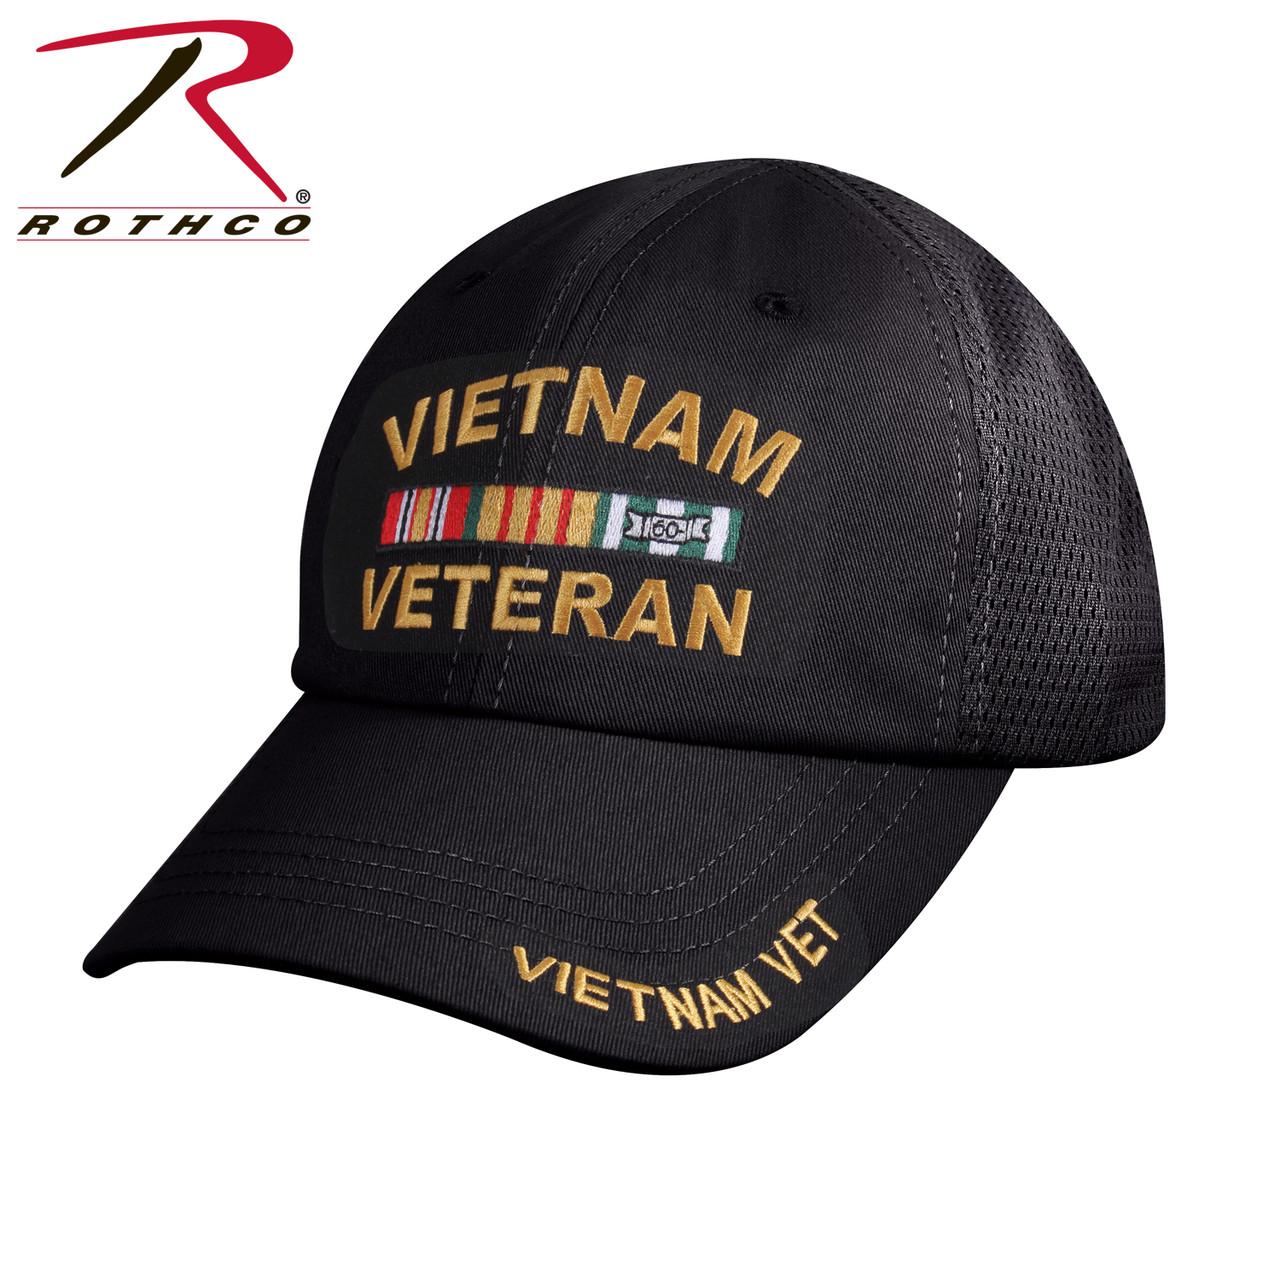 bcc0c61c410 Rothco Vietnam Veteran Tactical Mesh Back Cap - US Military Hats